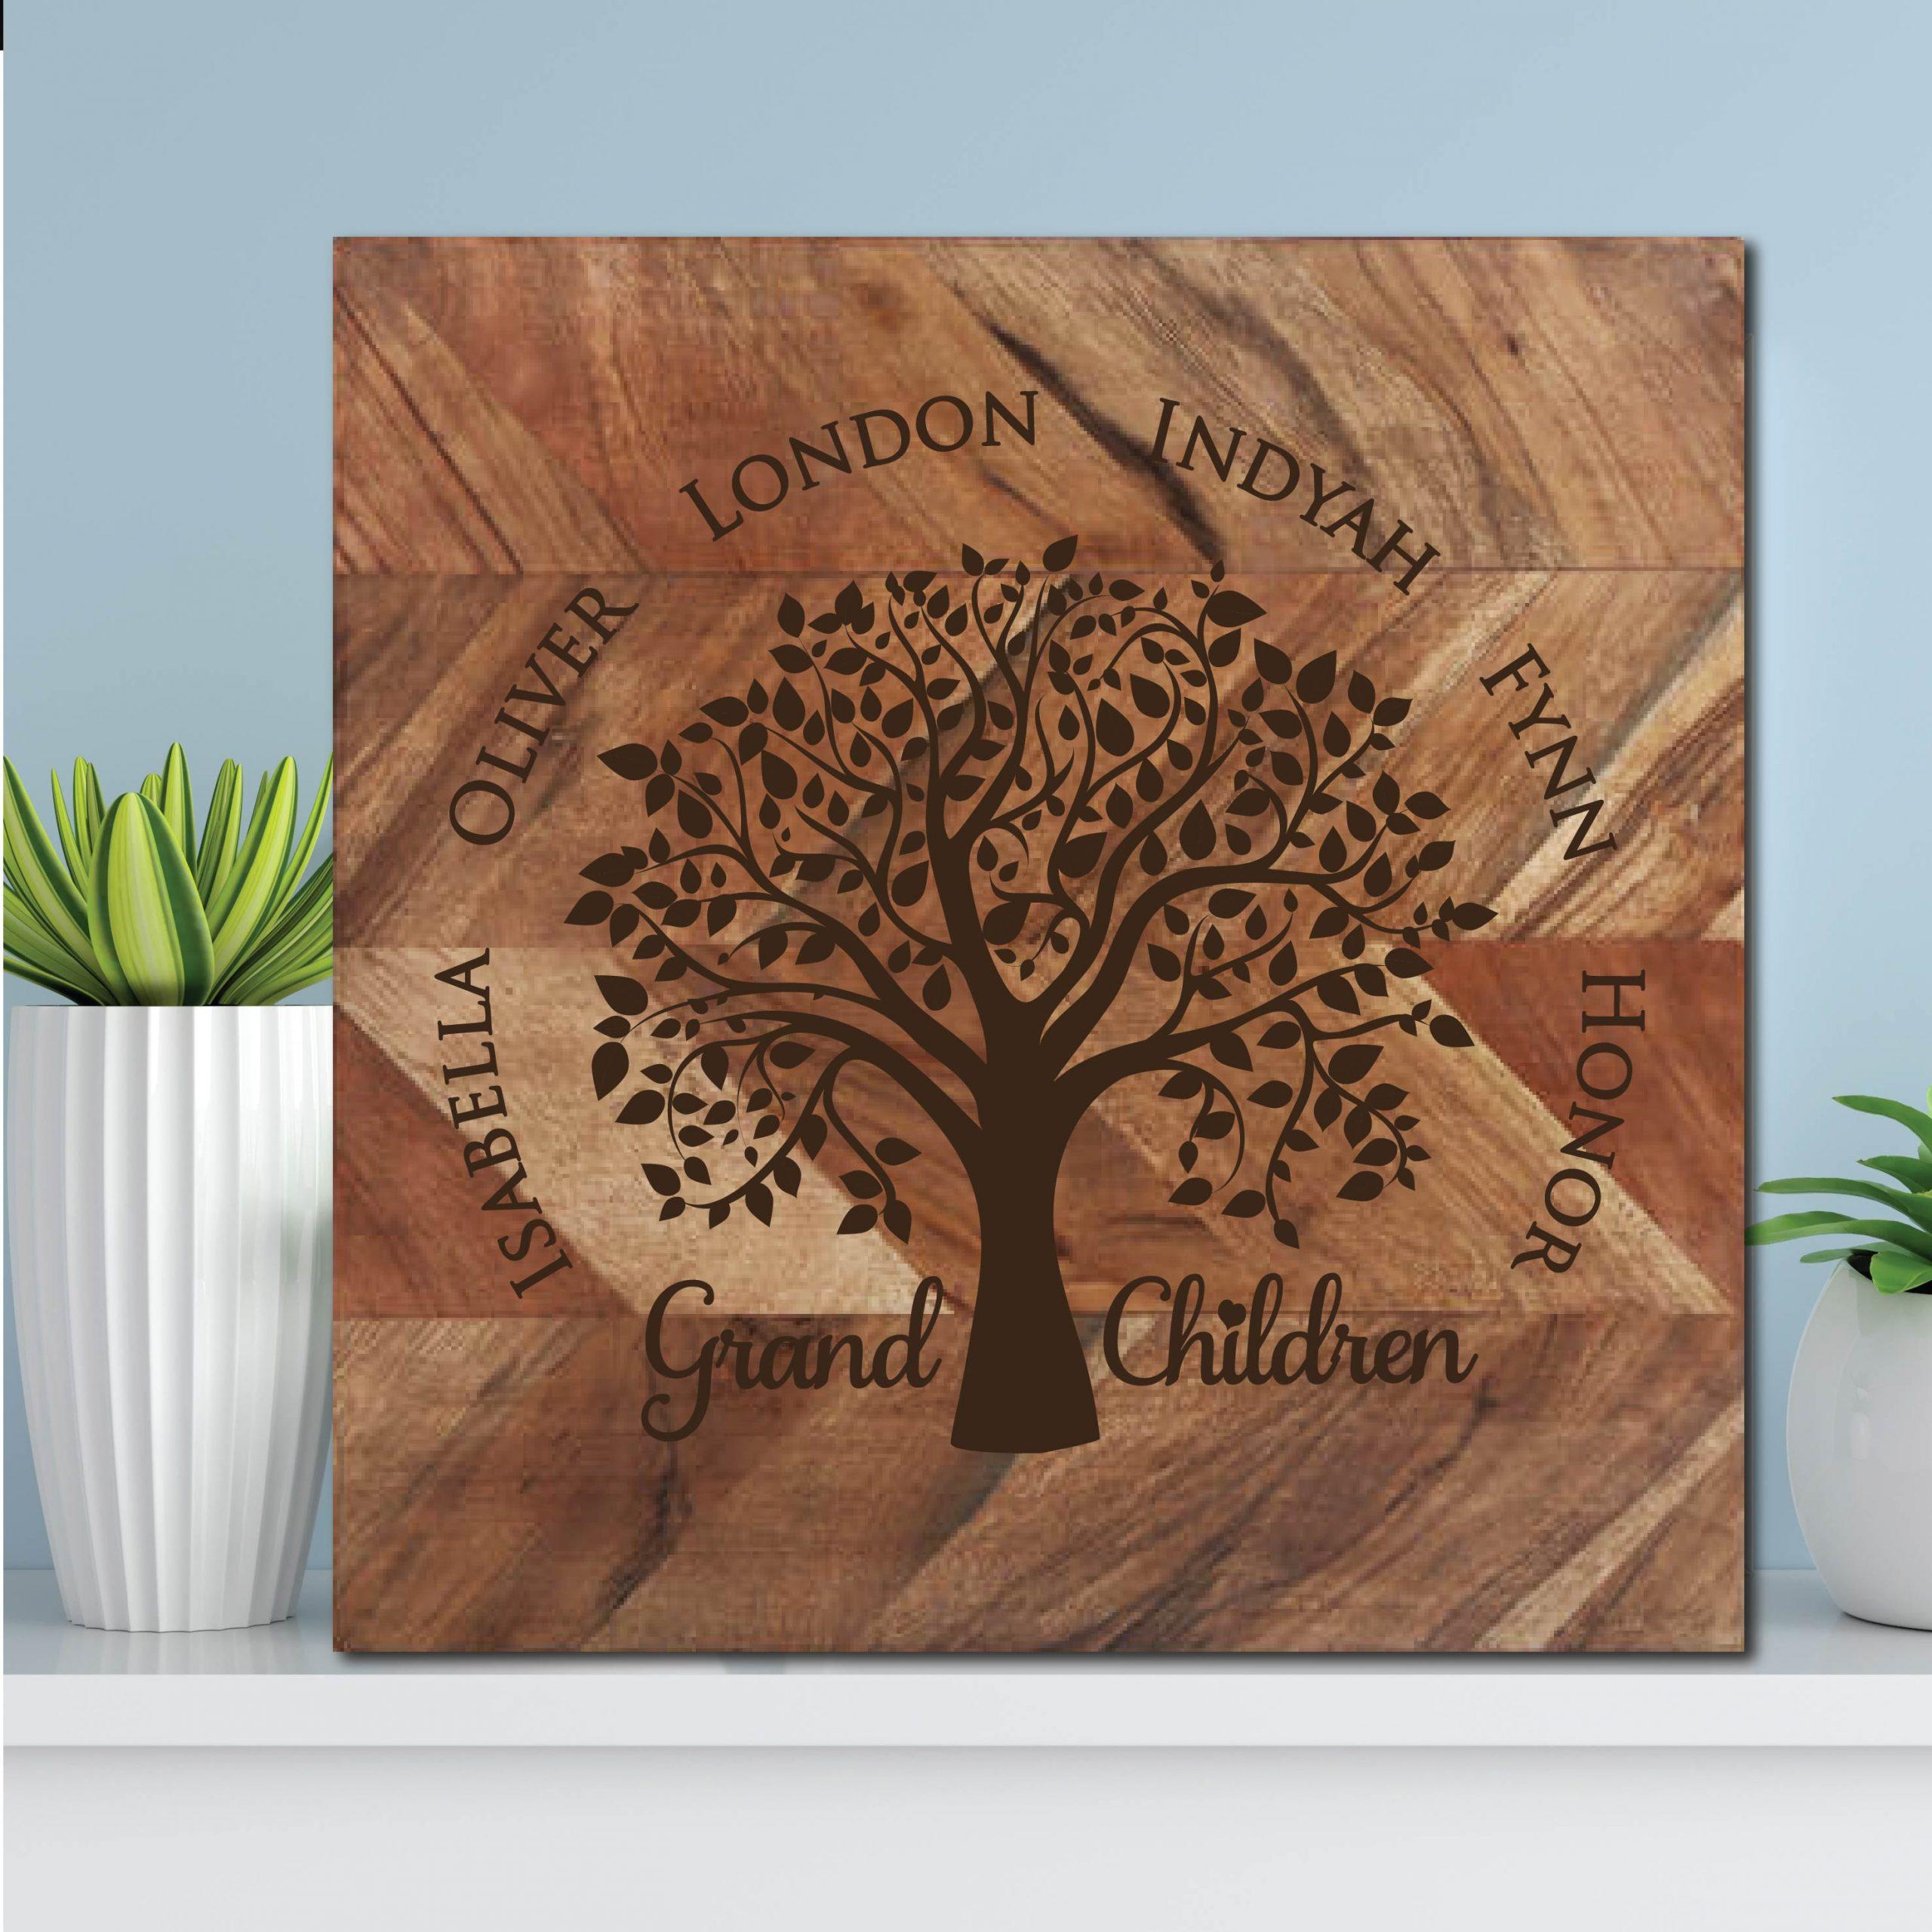 Grand Children Family Tree Chopping Board